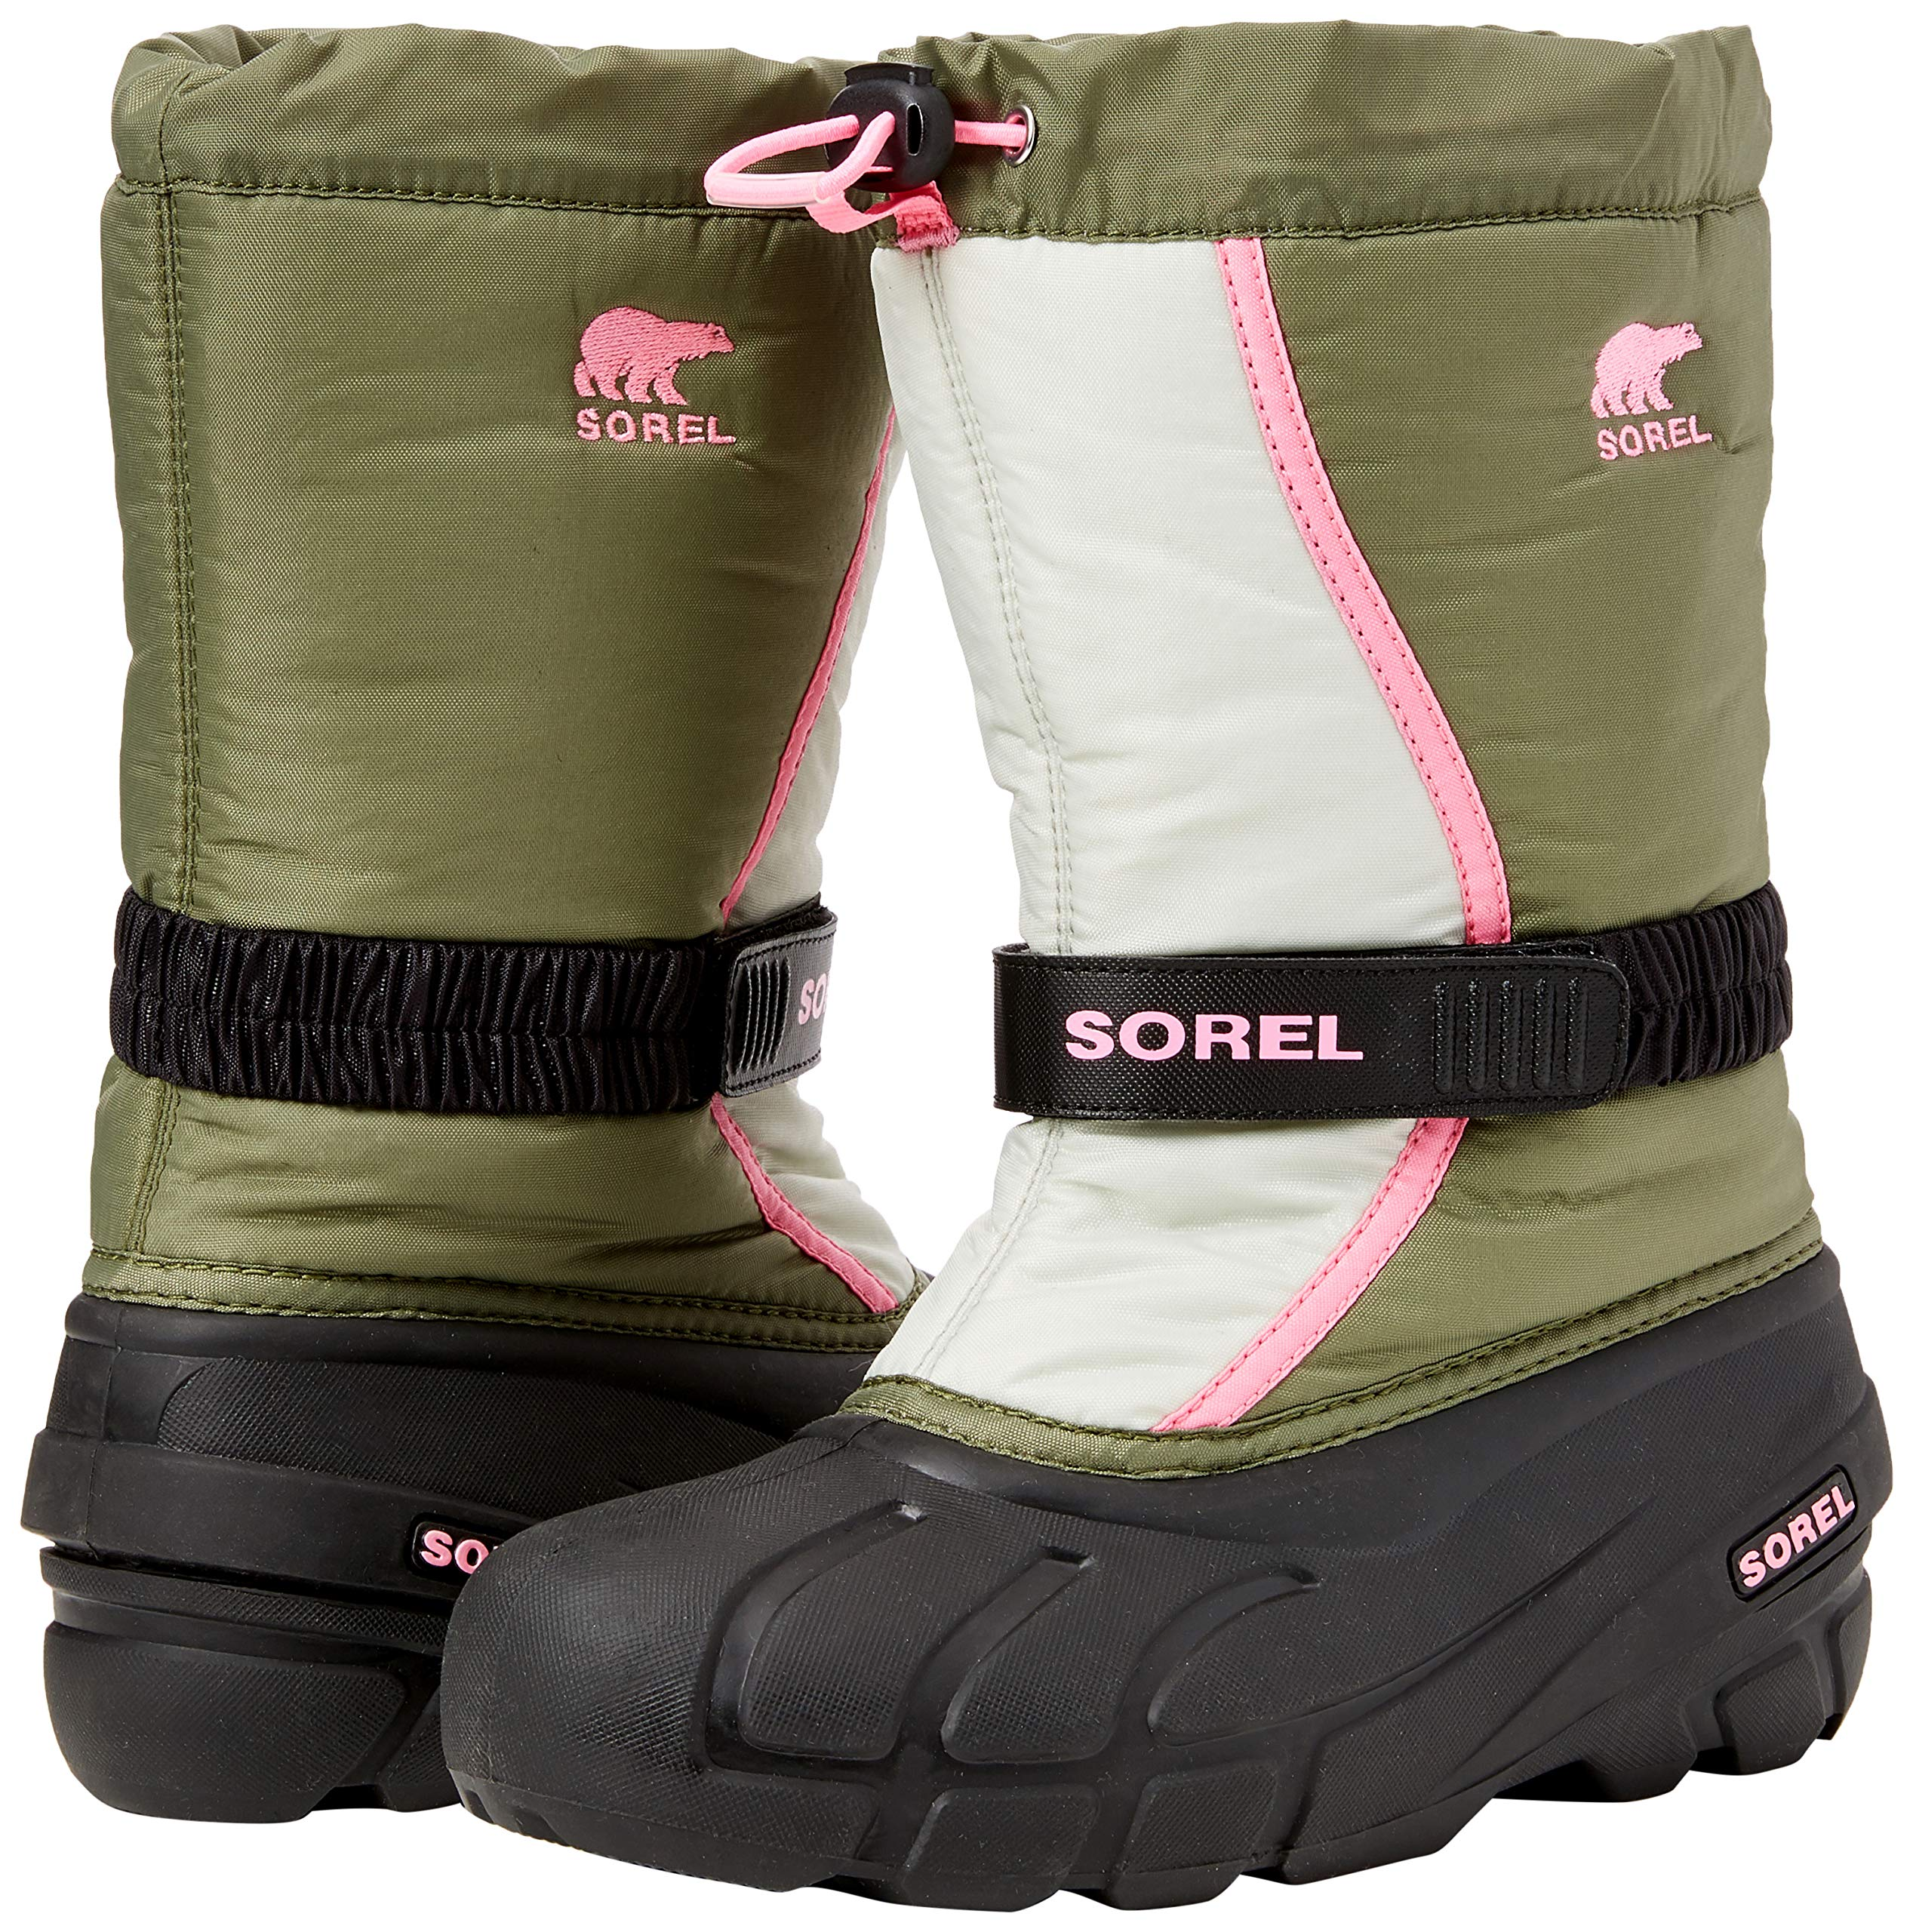 Sorel Girls' Youth Flurry Snow Boot, Hiker Green, Bubblegum, 5 M US Big Kid by Sorel (Image #5)